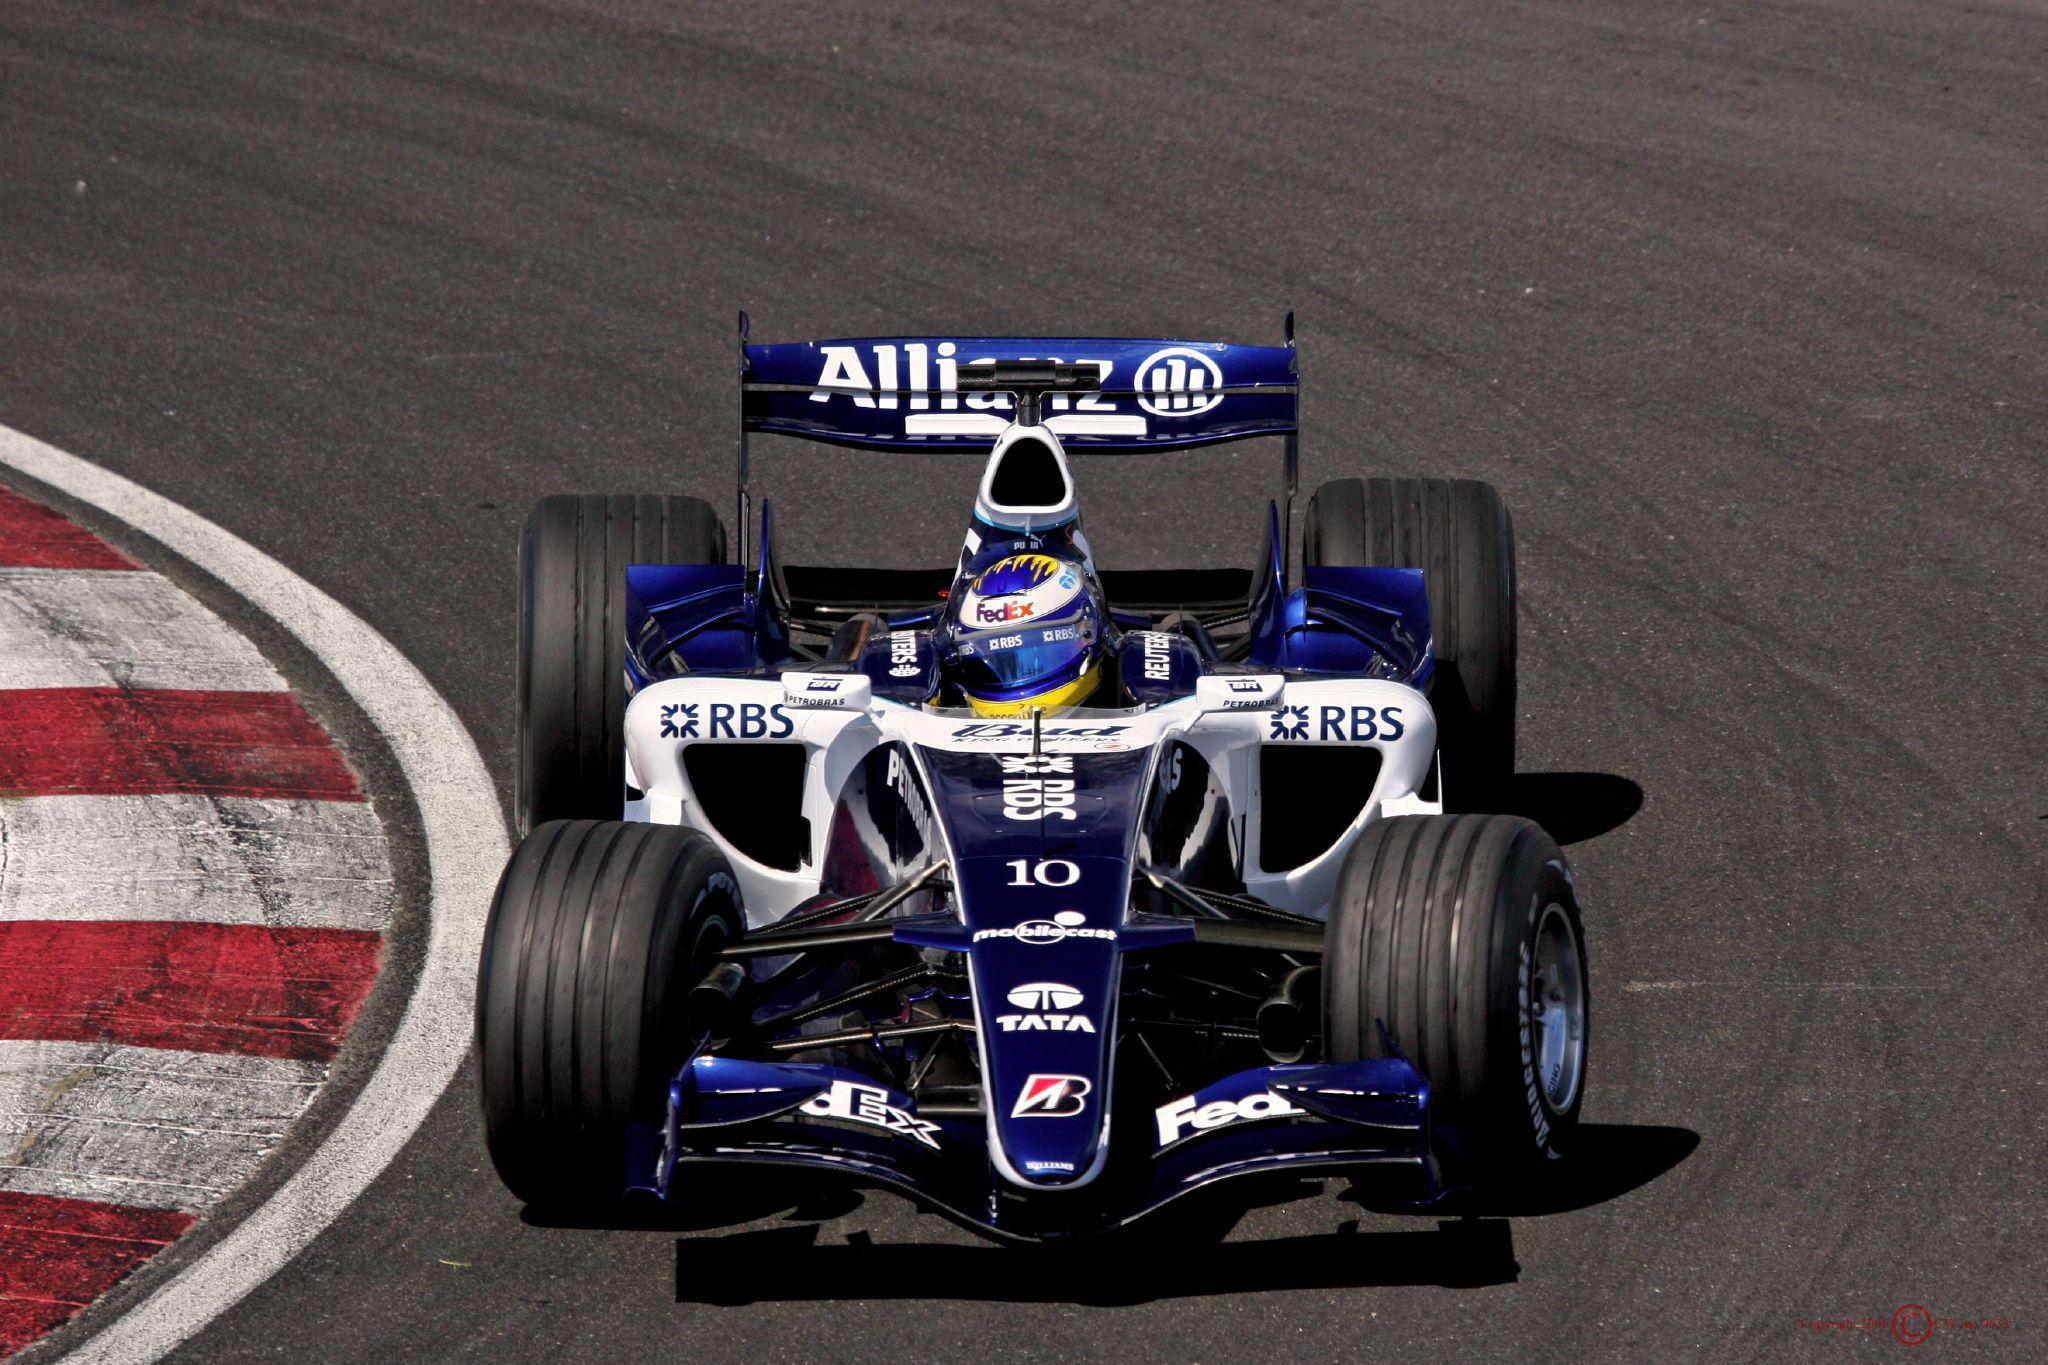 http://upload.wikimedia.org/wikipedia/commons/c/c0/Nico_Rosberg_Canada_2006.jpg